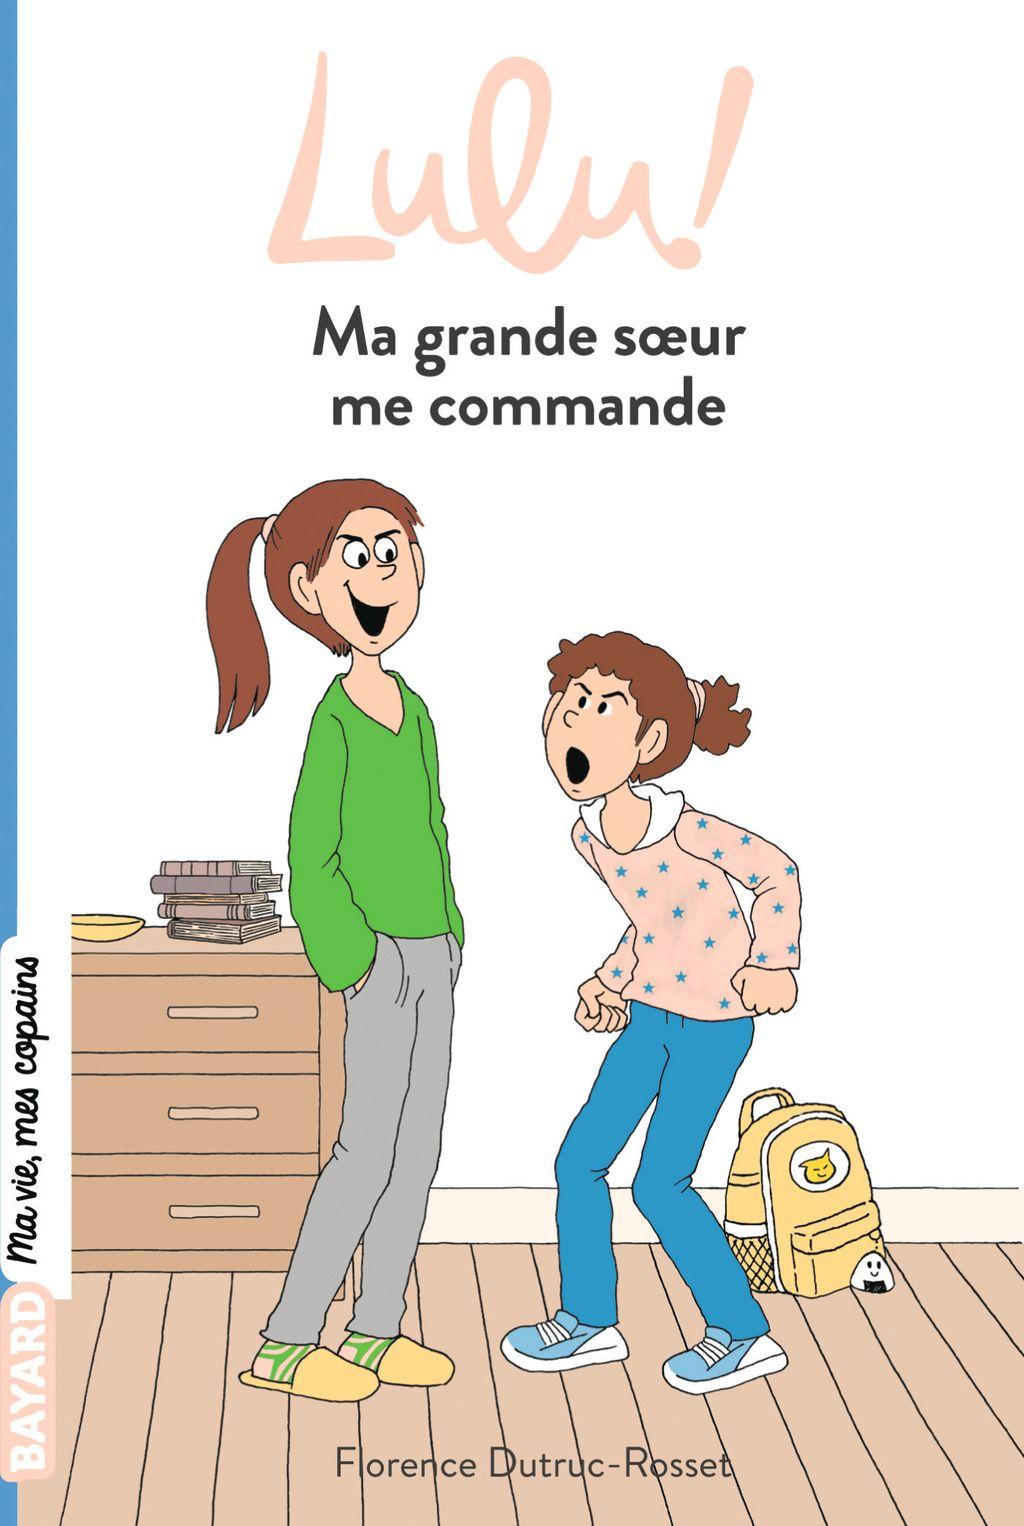 «Ma grande soeur me commande» cover